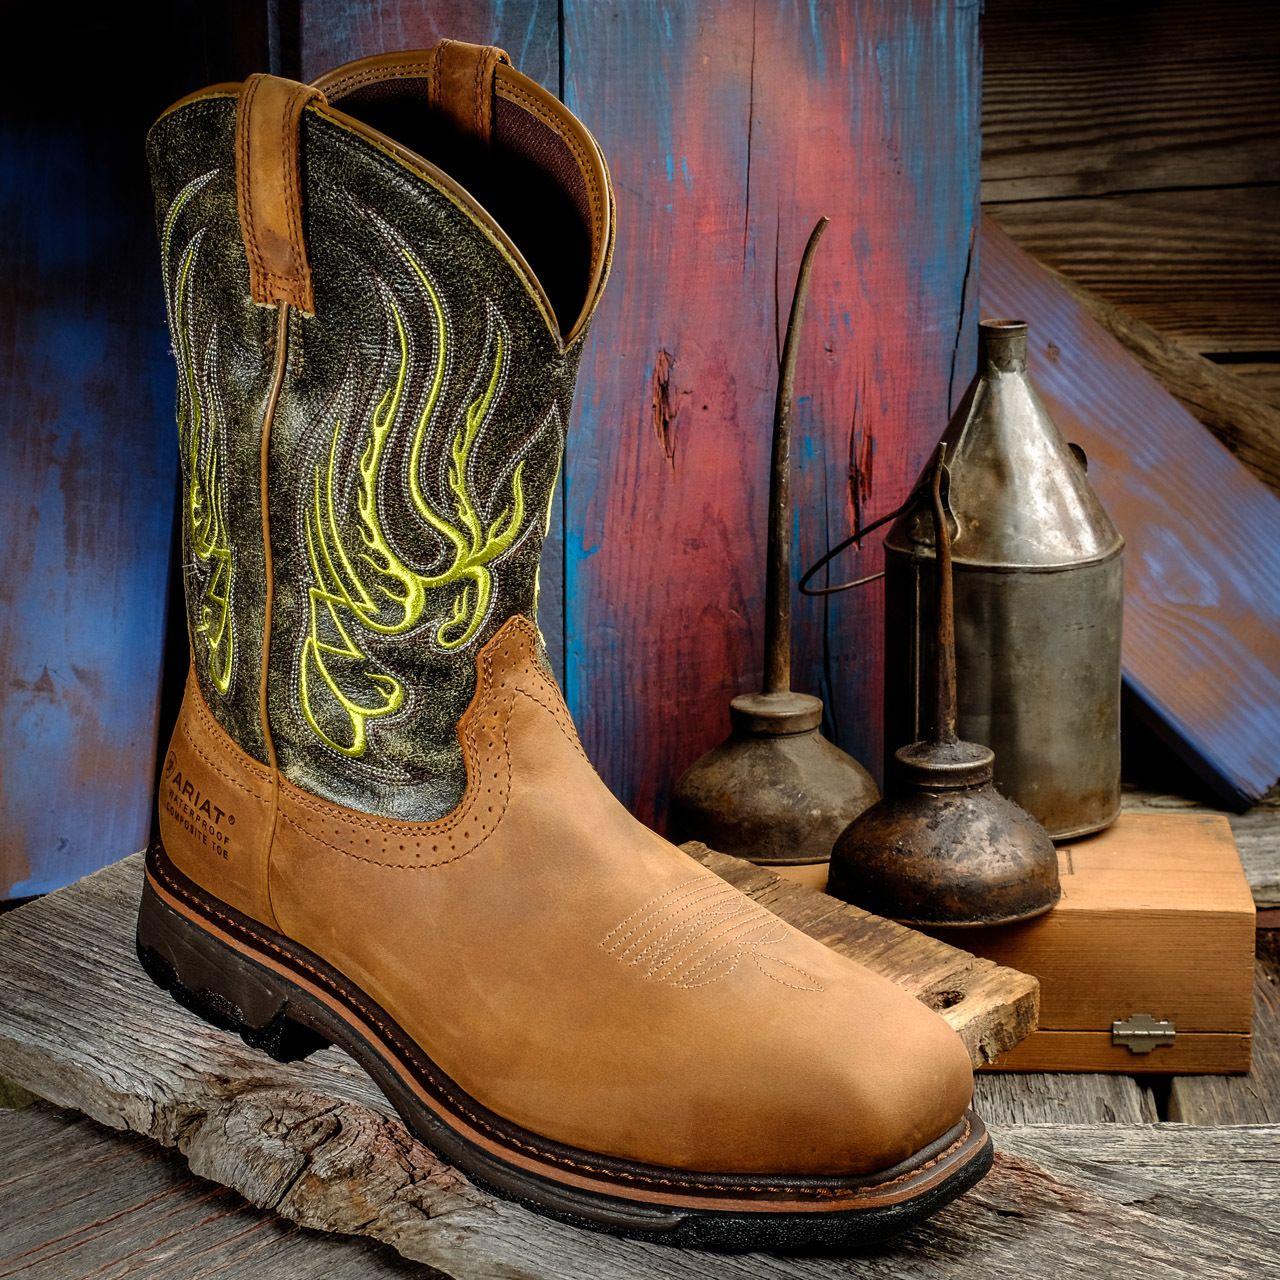 109090bdc8c Ariat 10015400 Workhog Mesteno Men s Safety Toe Work Boot - Boyers BootNShoe